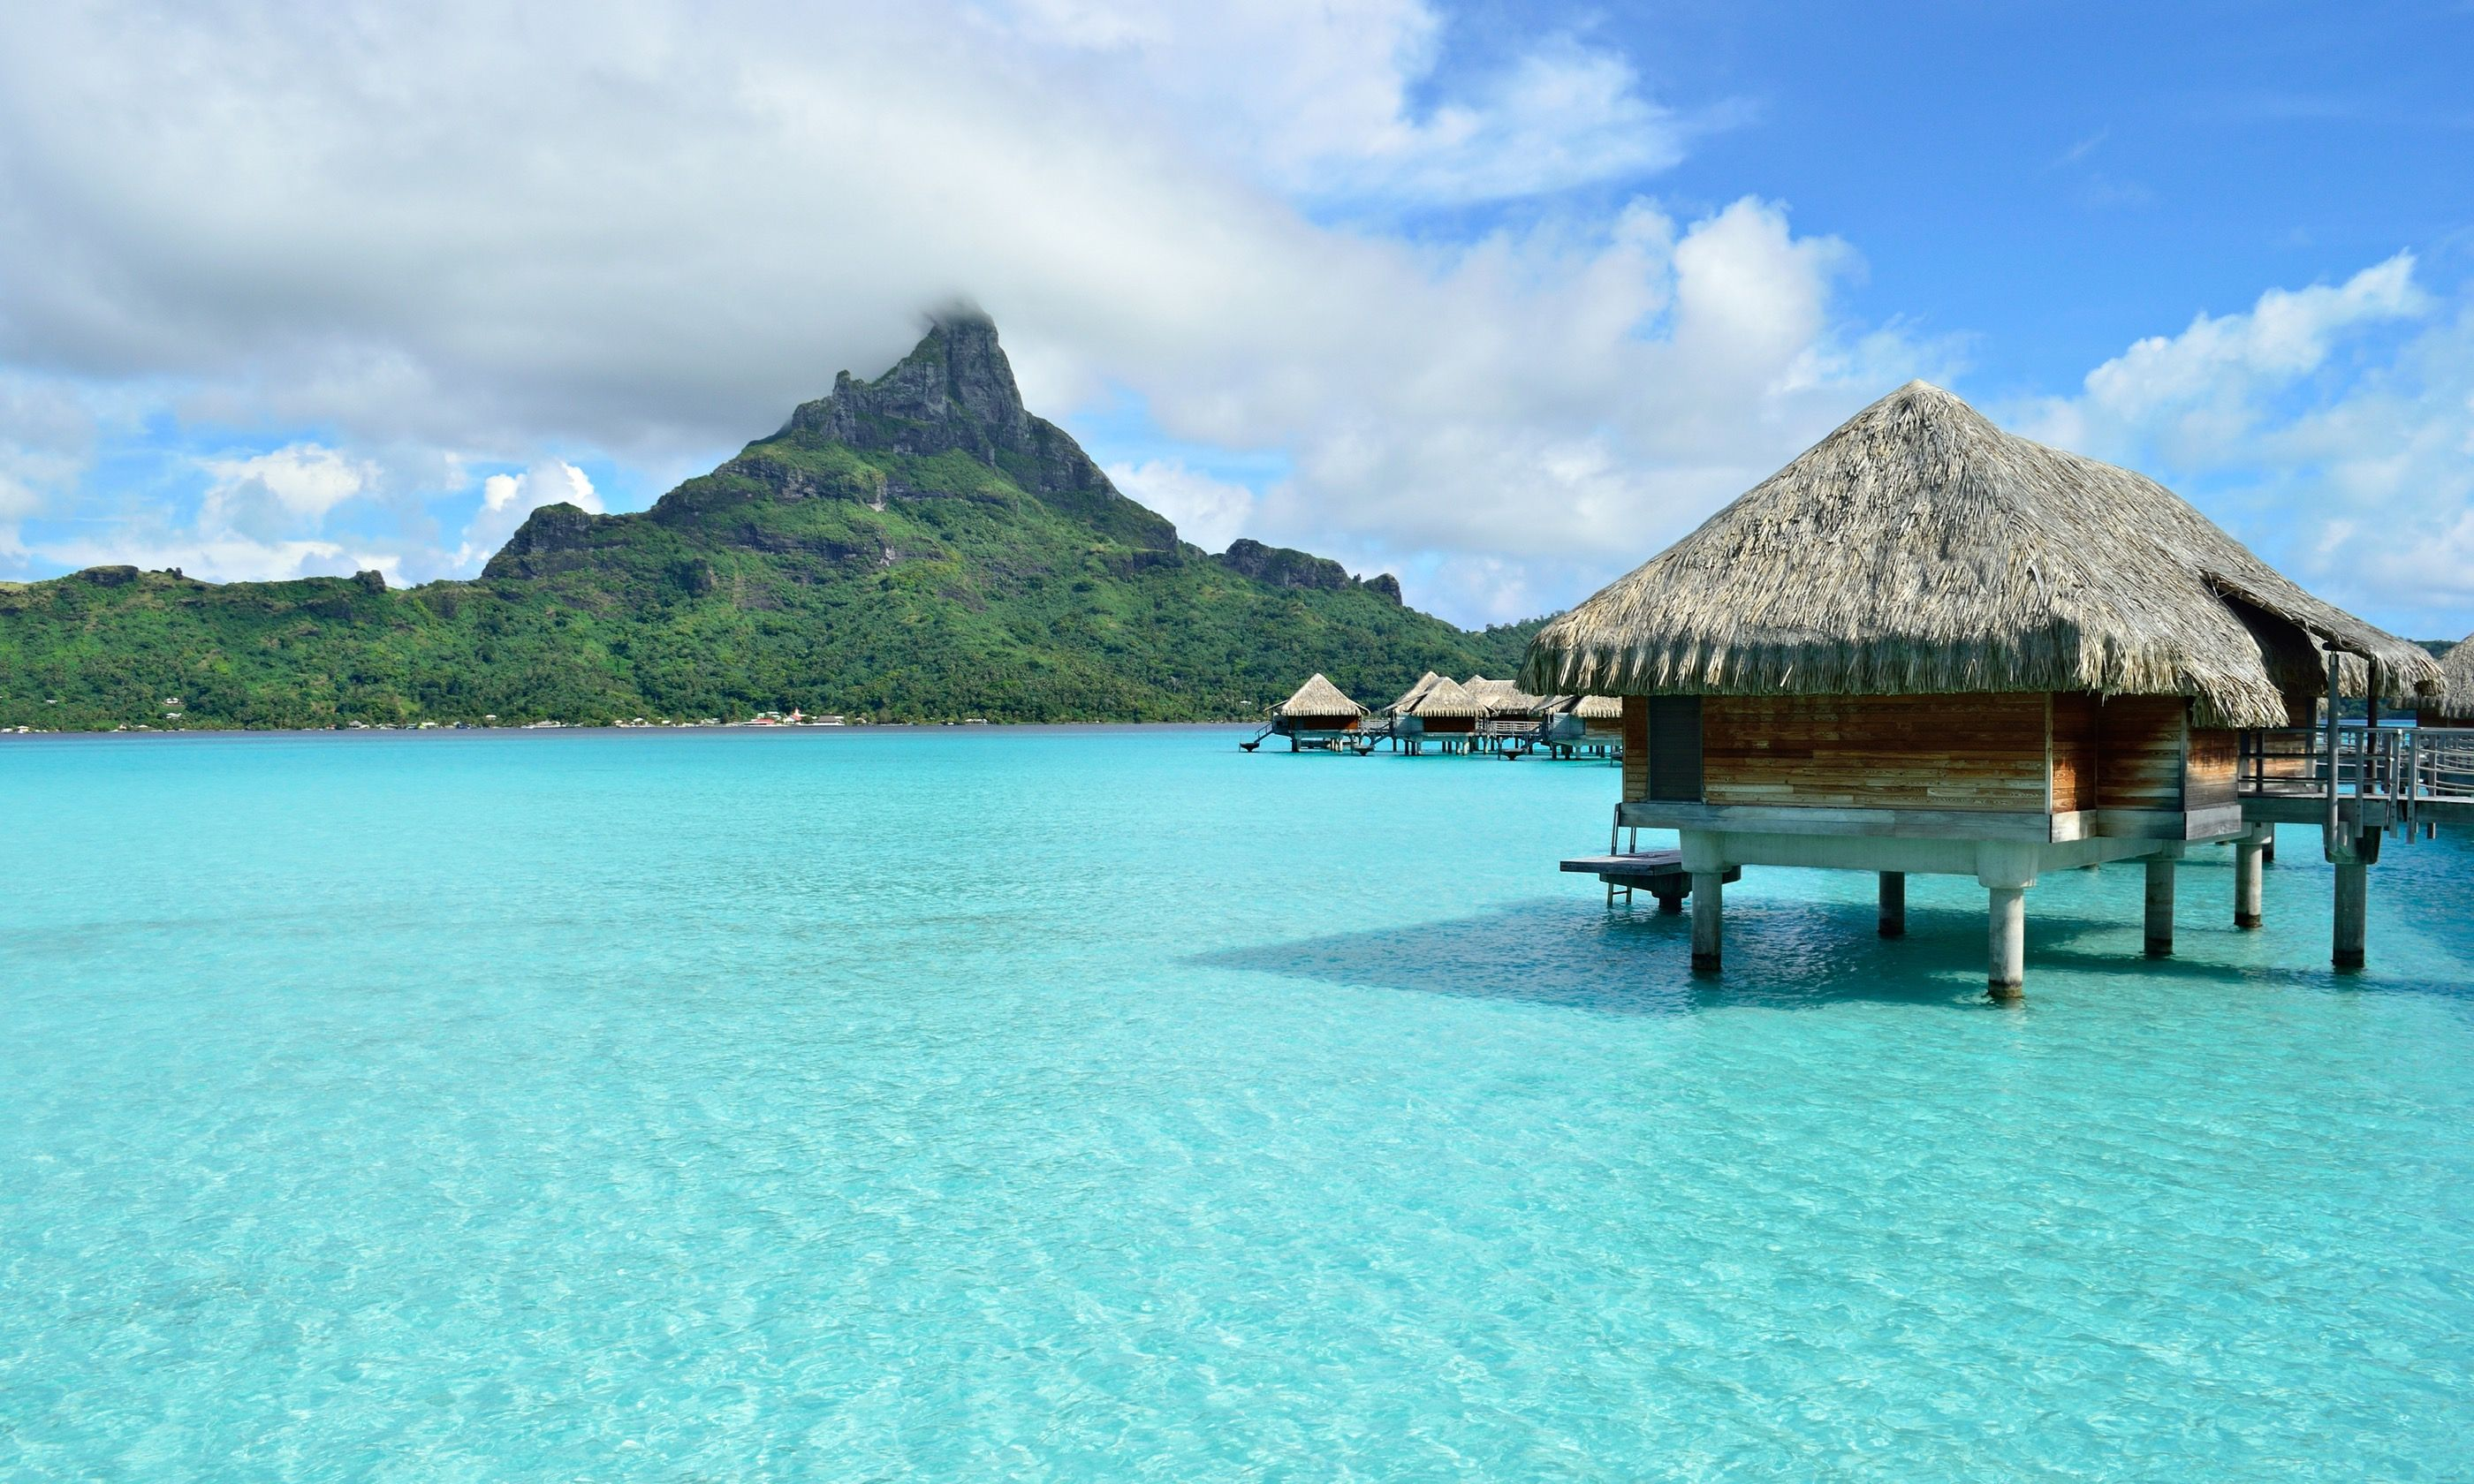 Overwater bungalow in Bora Bora (Dreamstime)